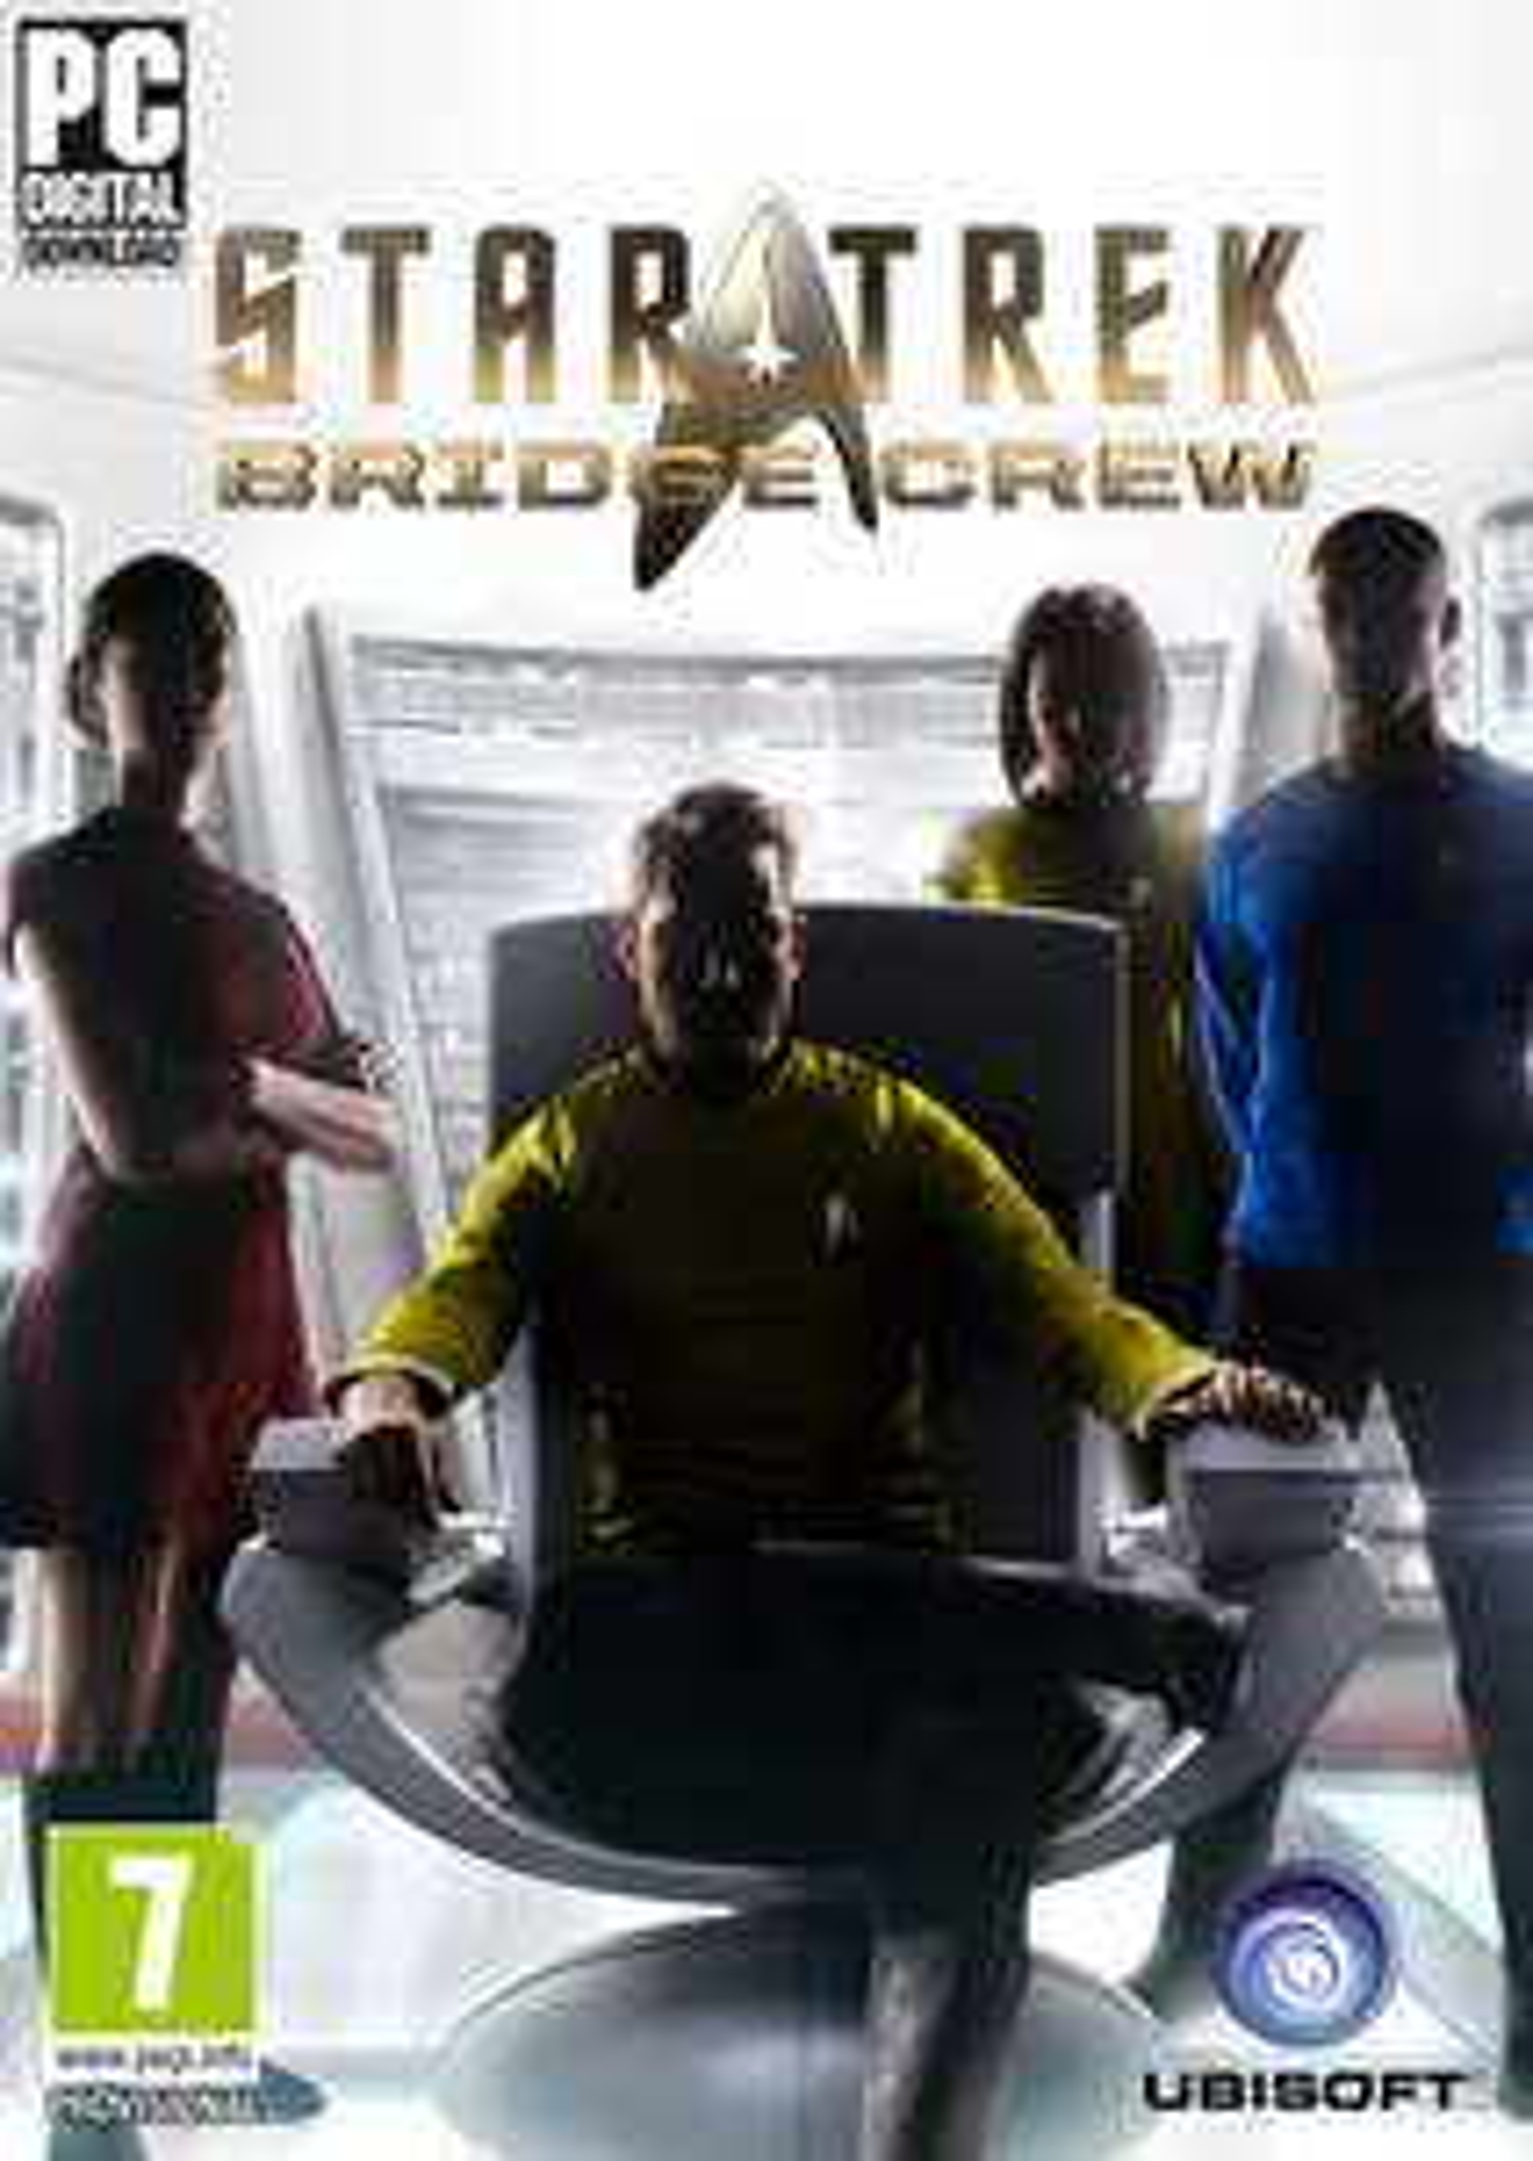 Star Trek Bridge Crew [Steam PC Code] £16 at Amazon